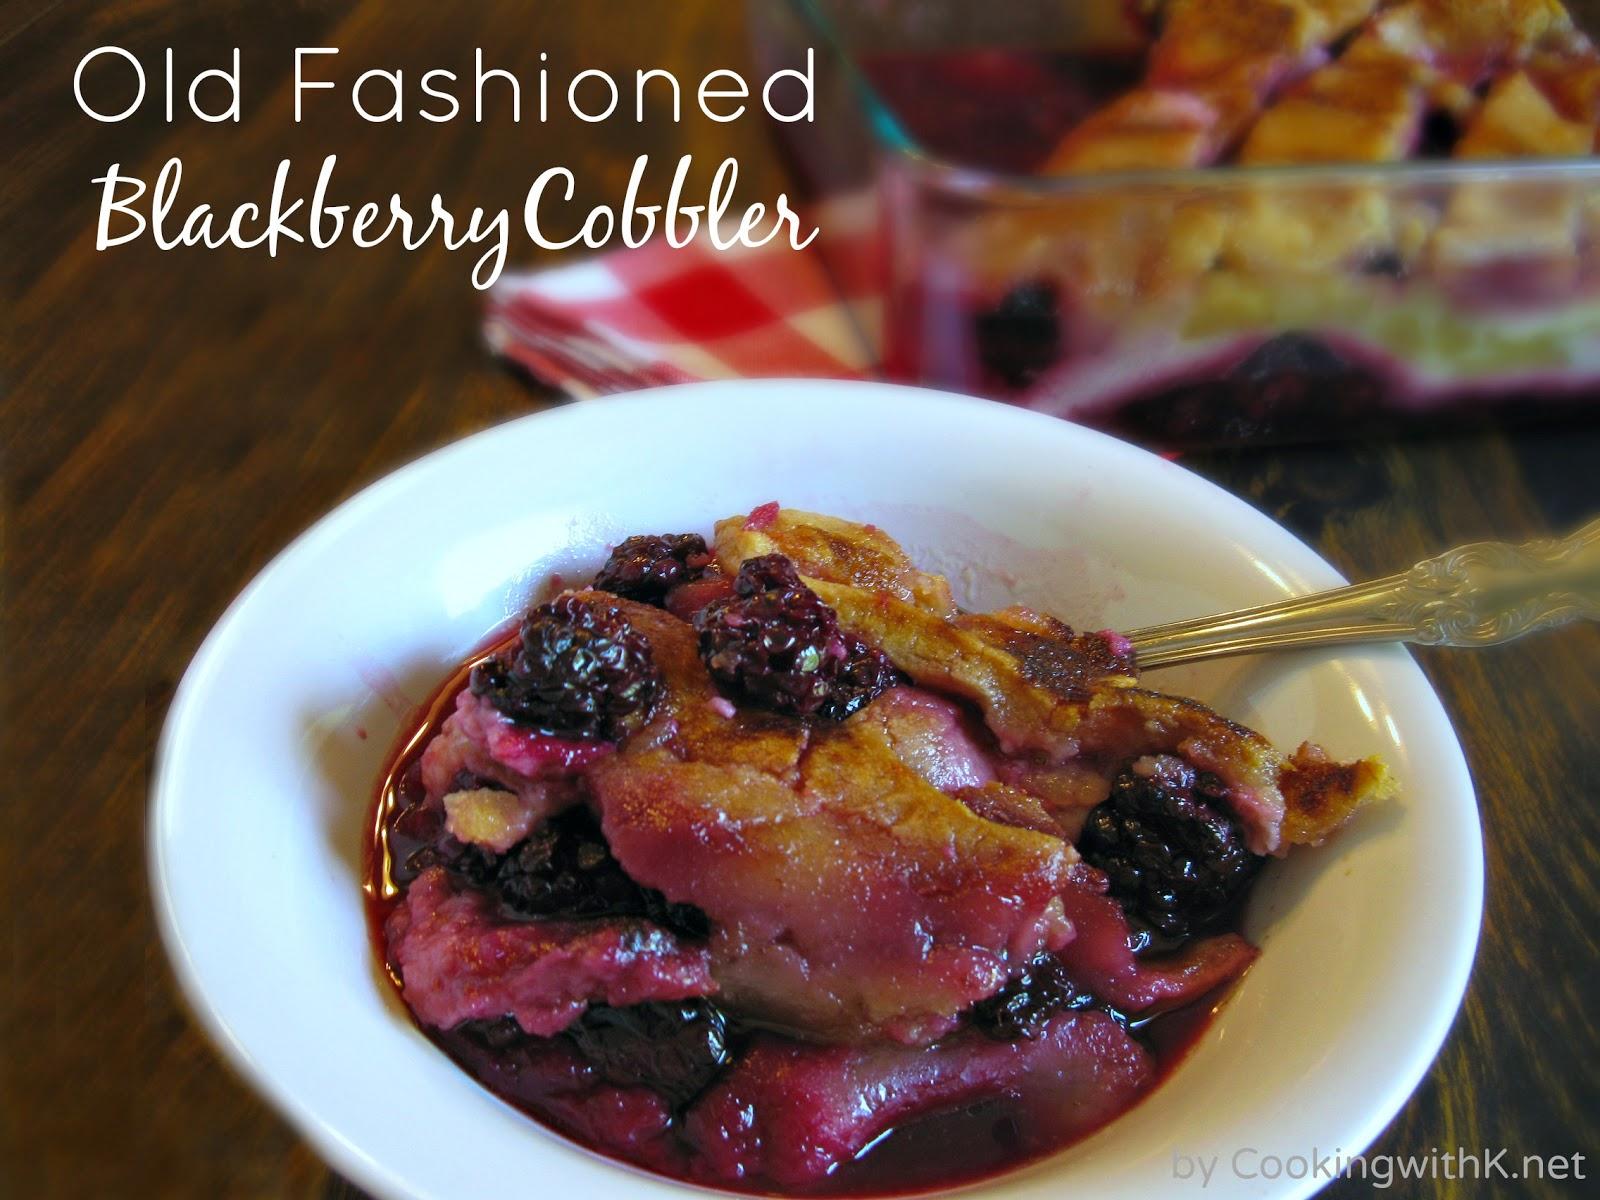 Old Fashioned Blackberry Cobbler